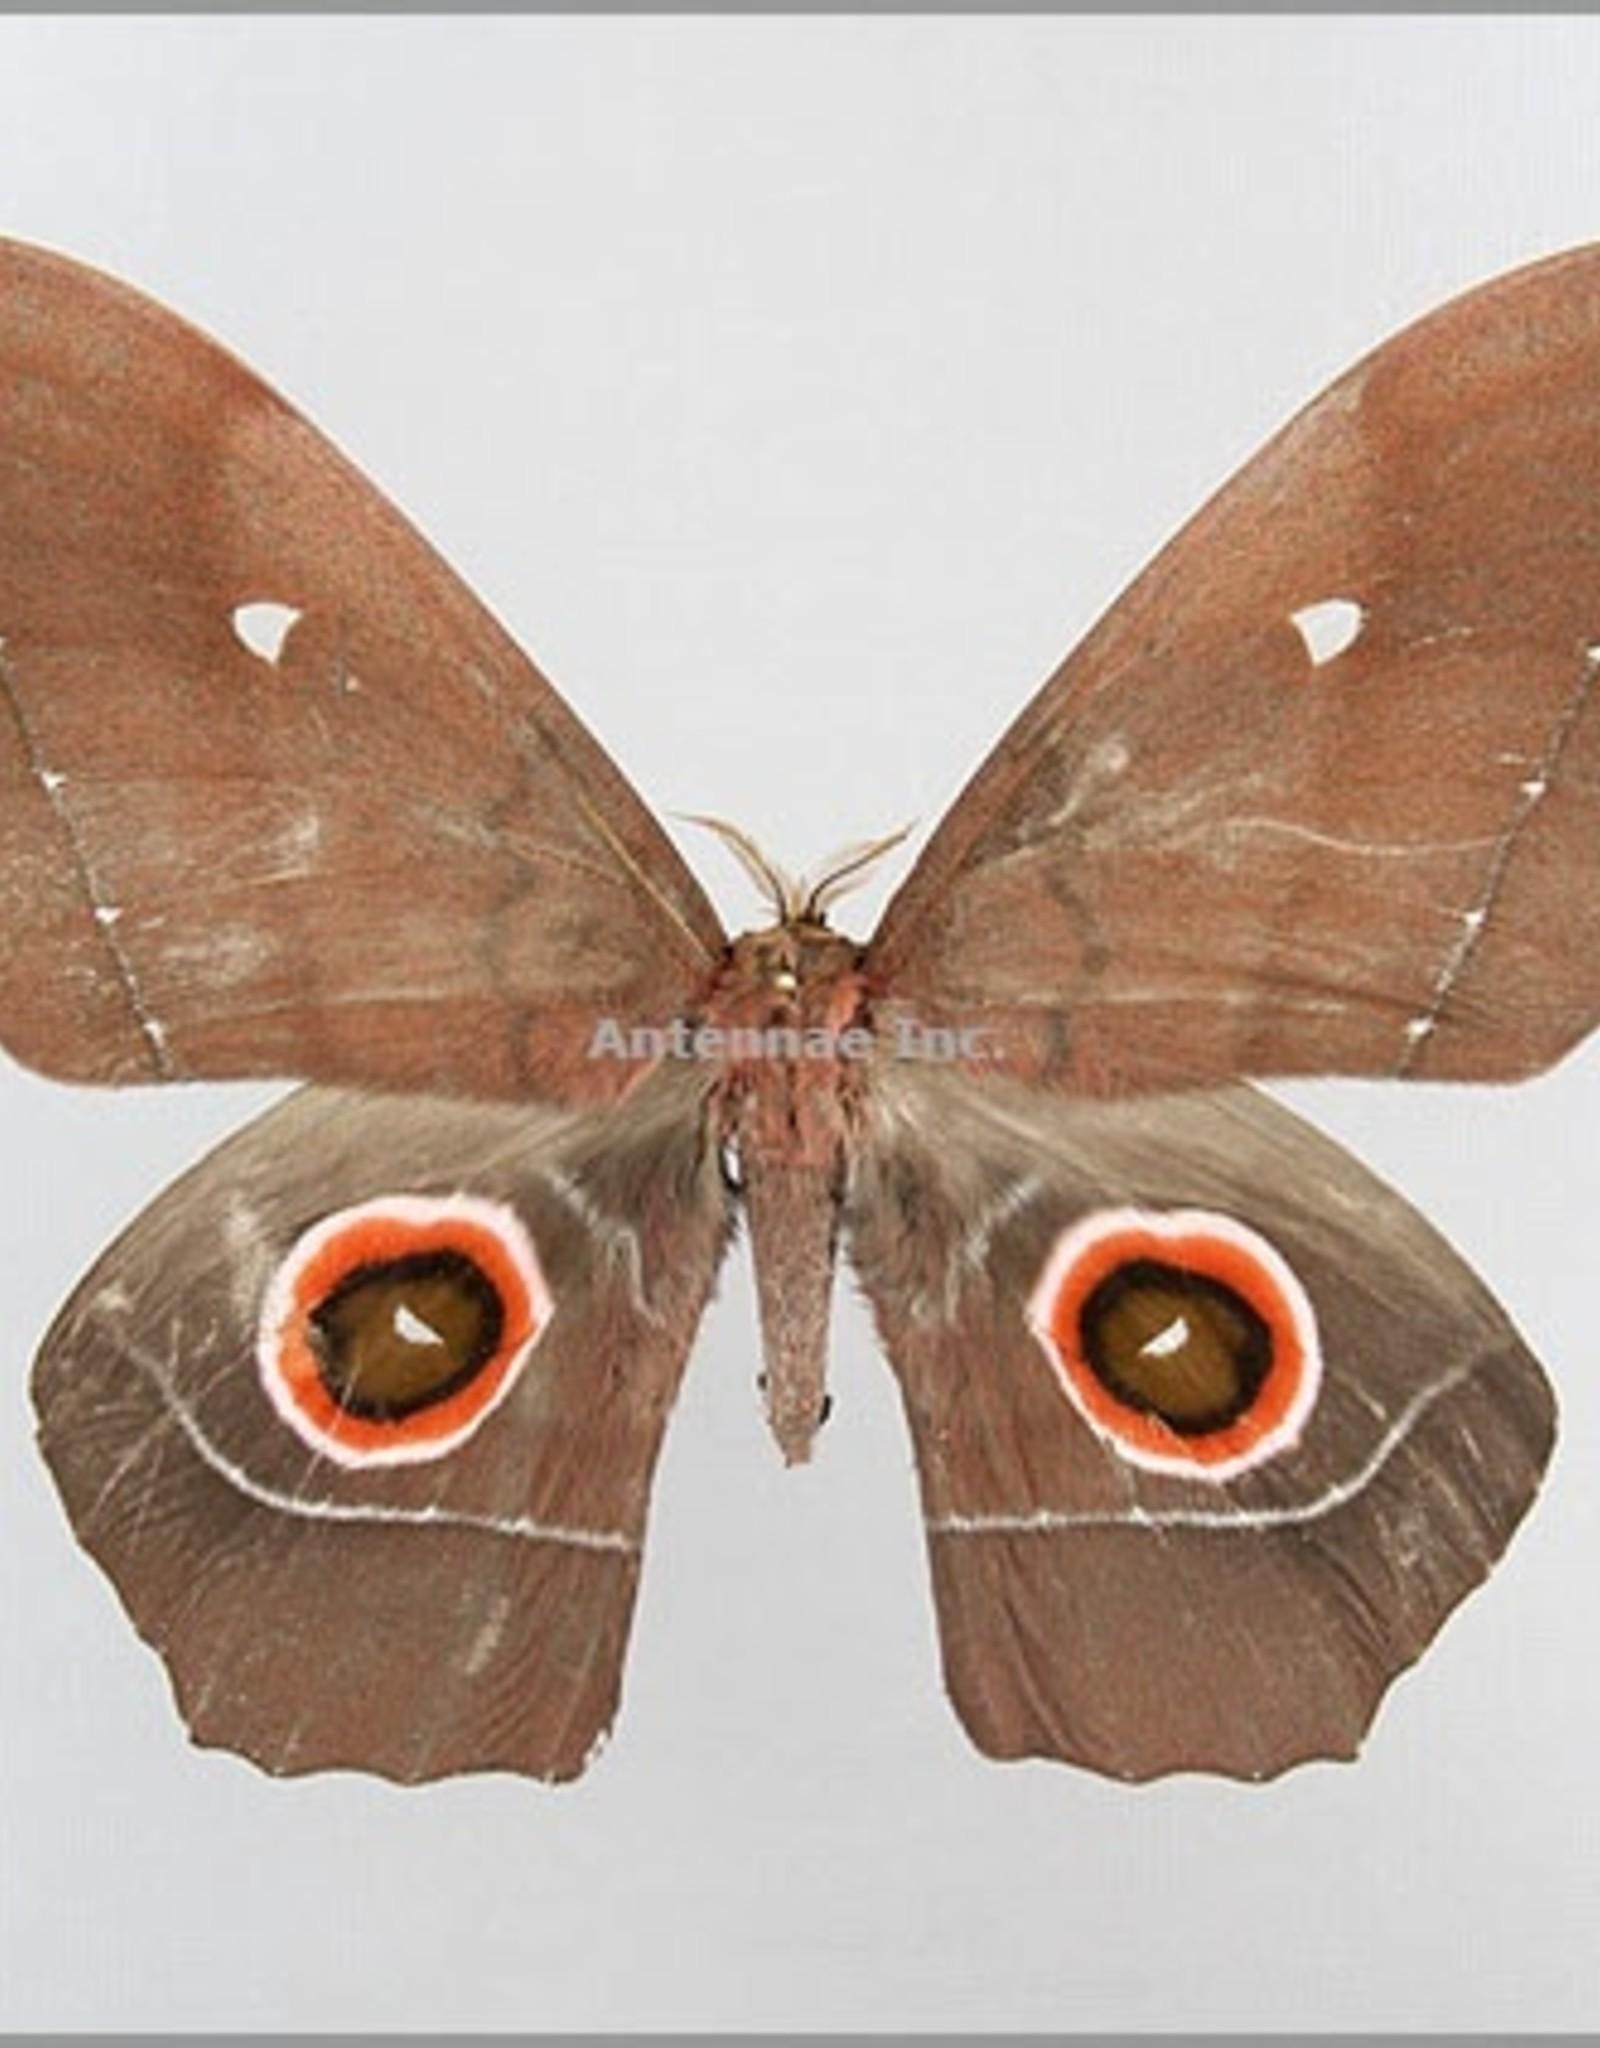 Nudaurelia eblis buchholzi M A1- Cameroon